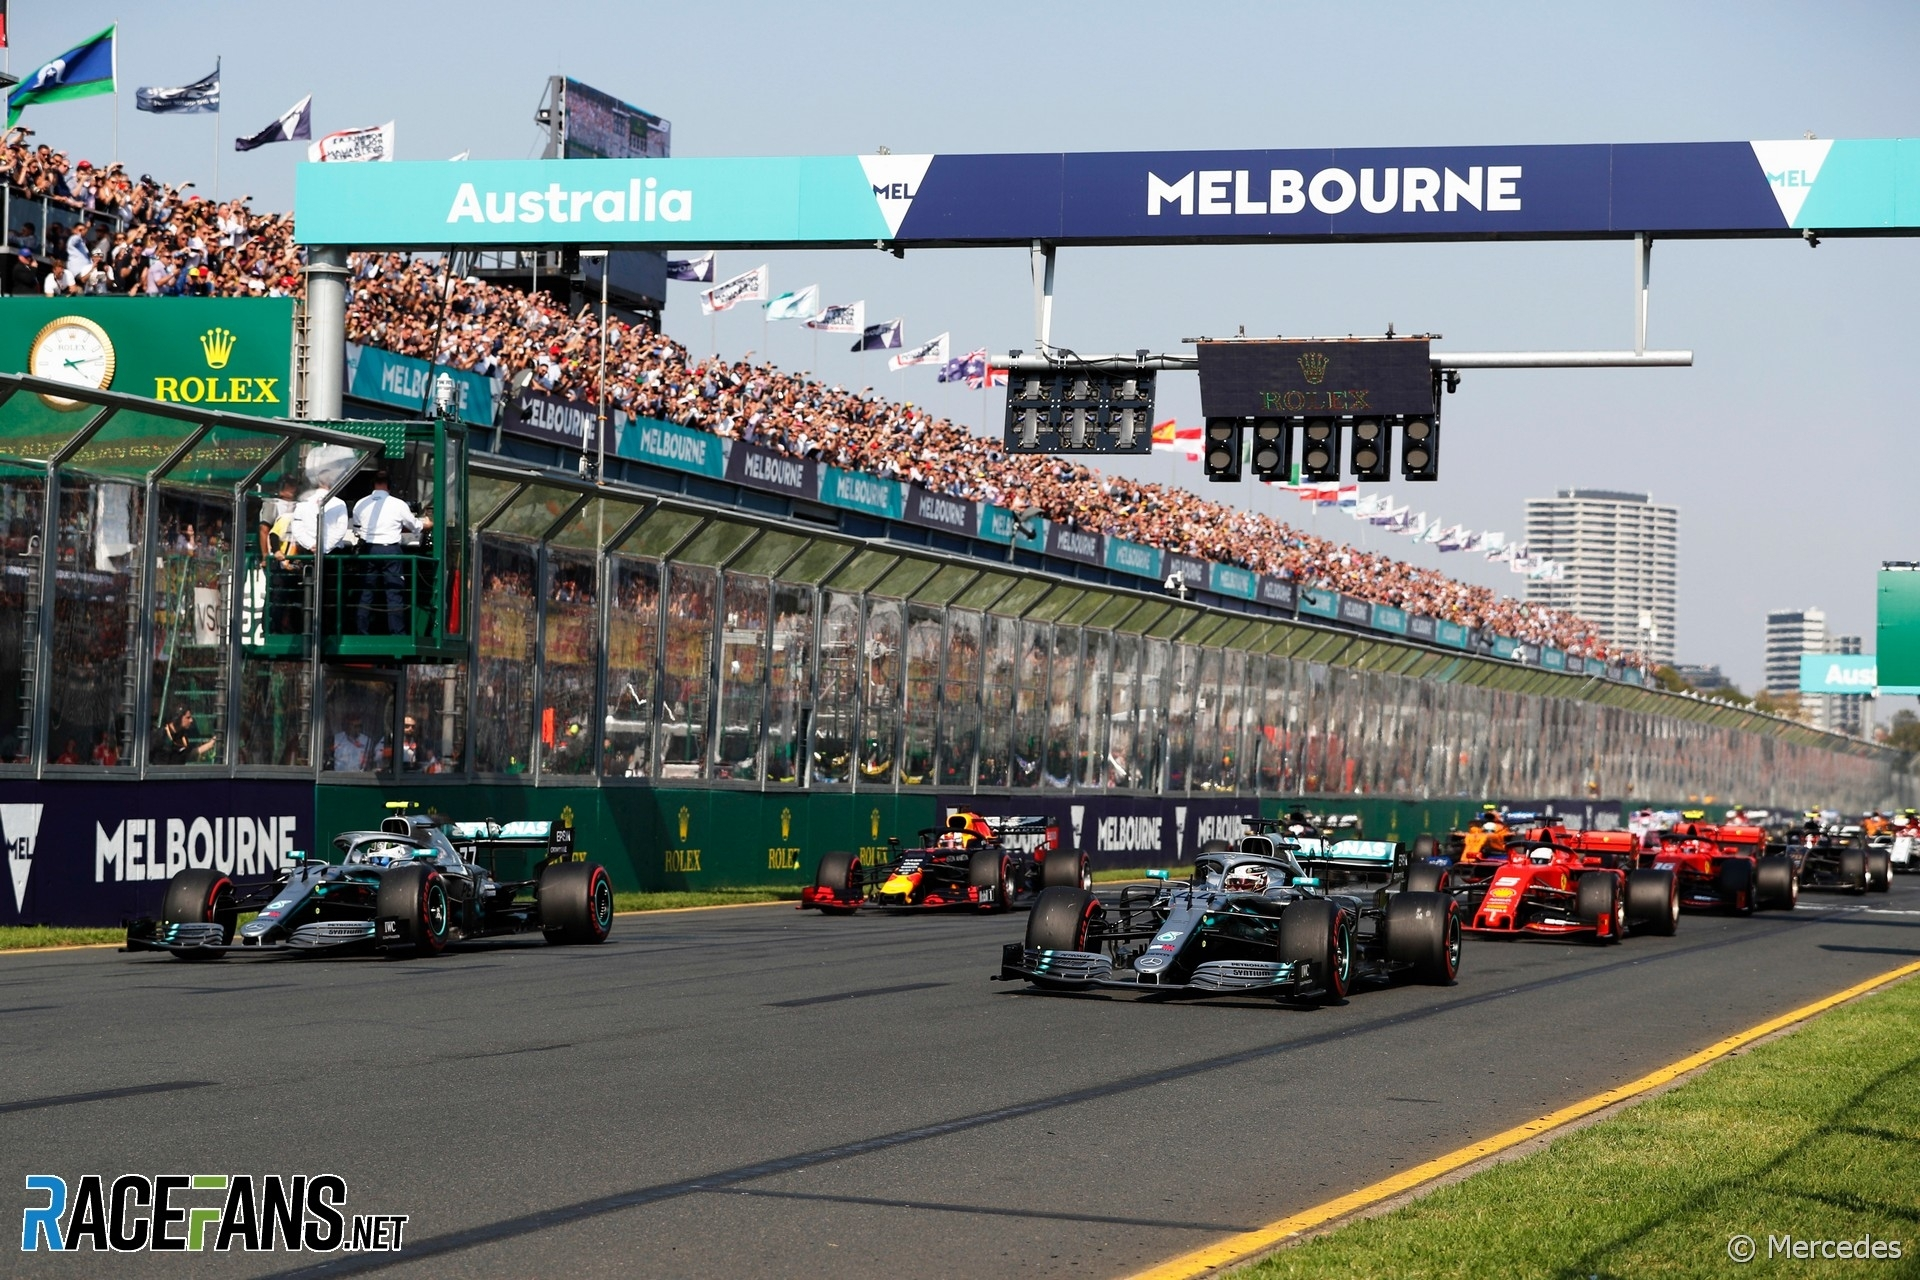 2019 F1 Calendar: Formula One Race Schedule - Racefans